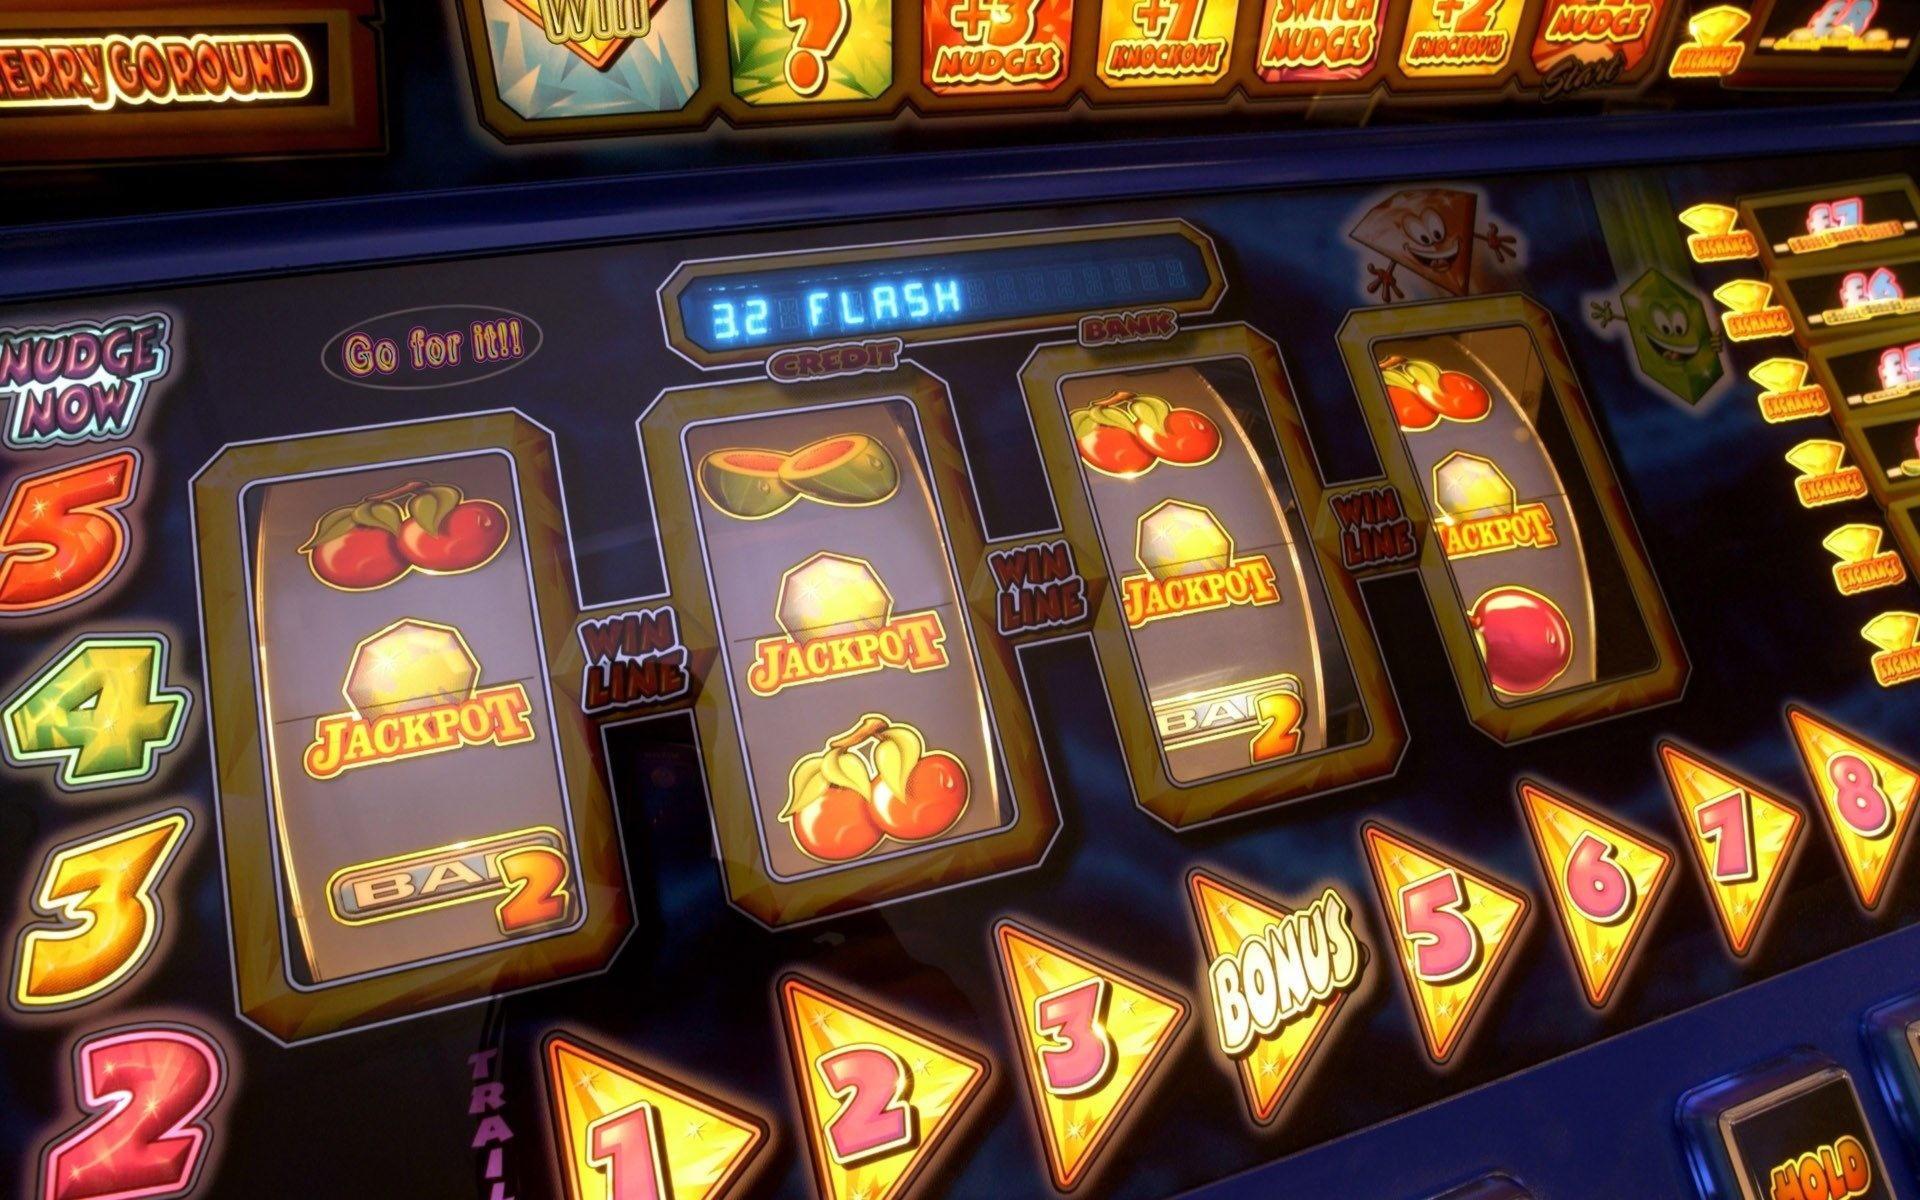 €2195 no deposit at Mr. Win Casino